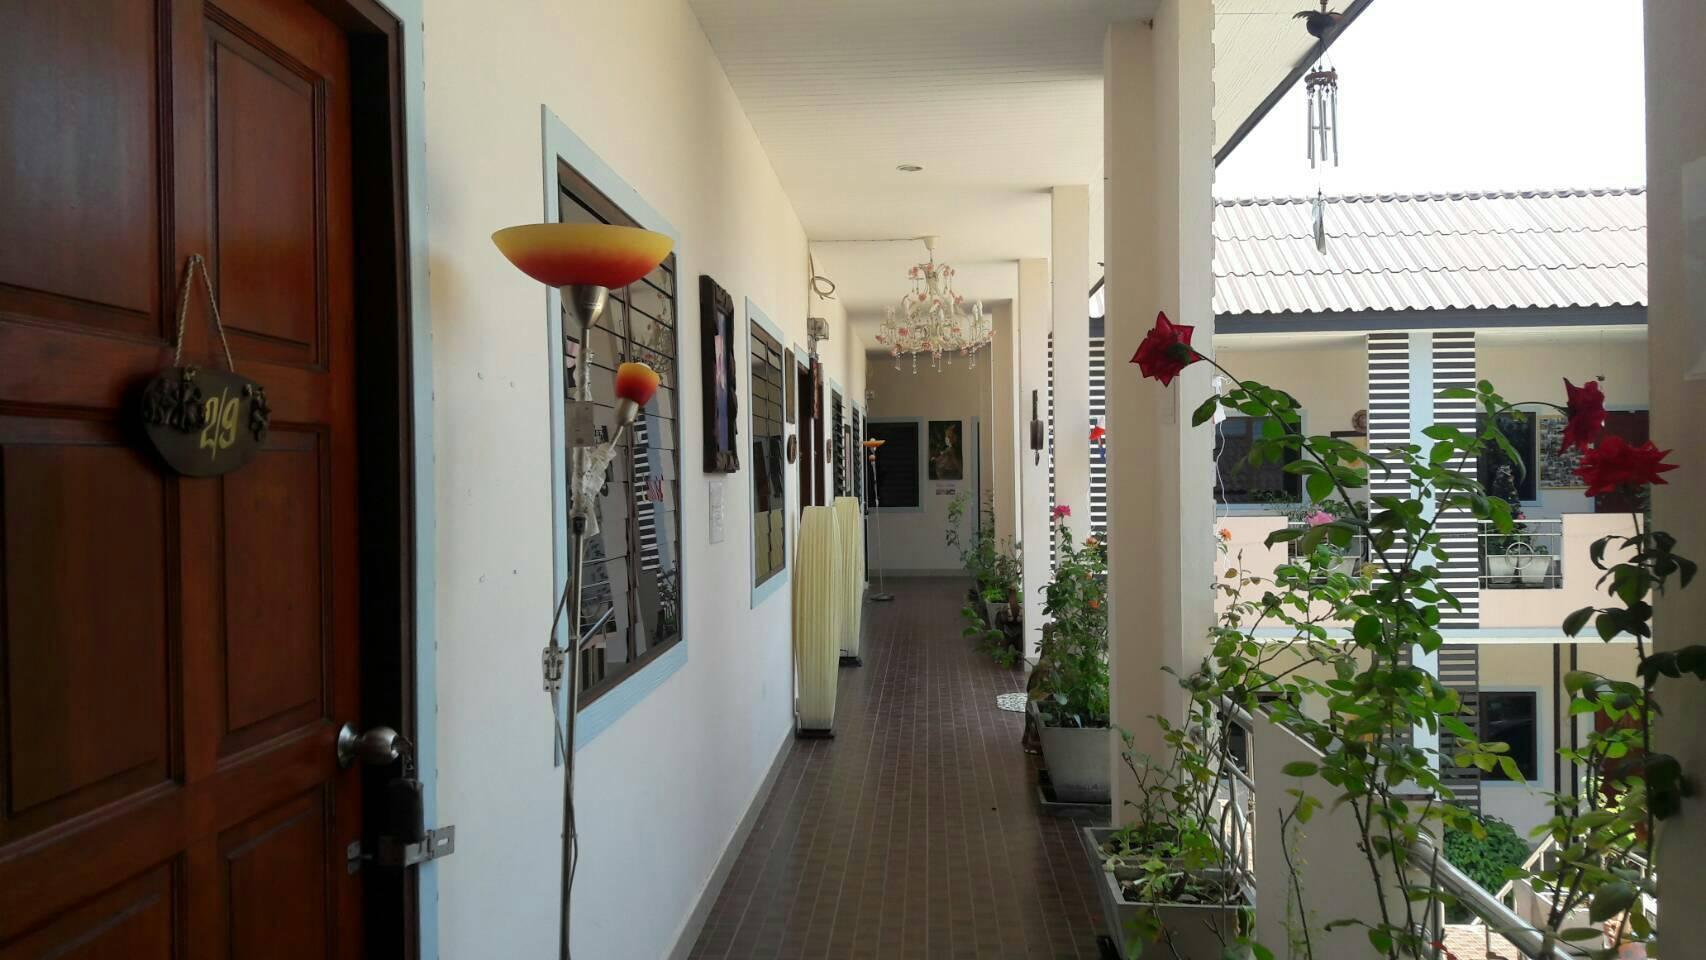 Ban Suan Kularb Surat Thani Fan Room 2